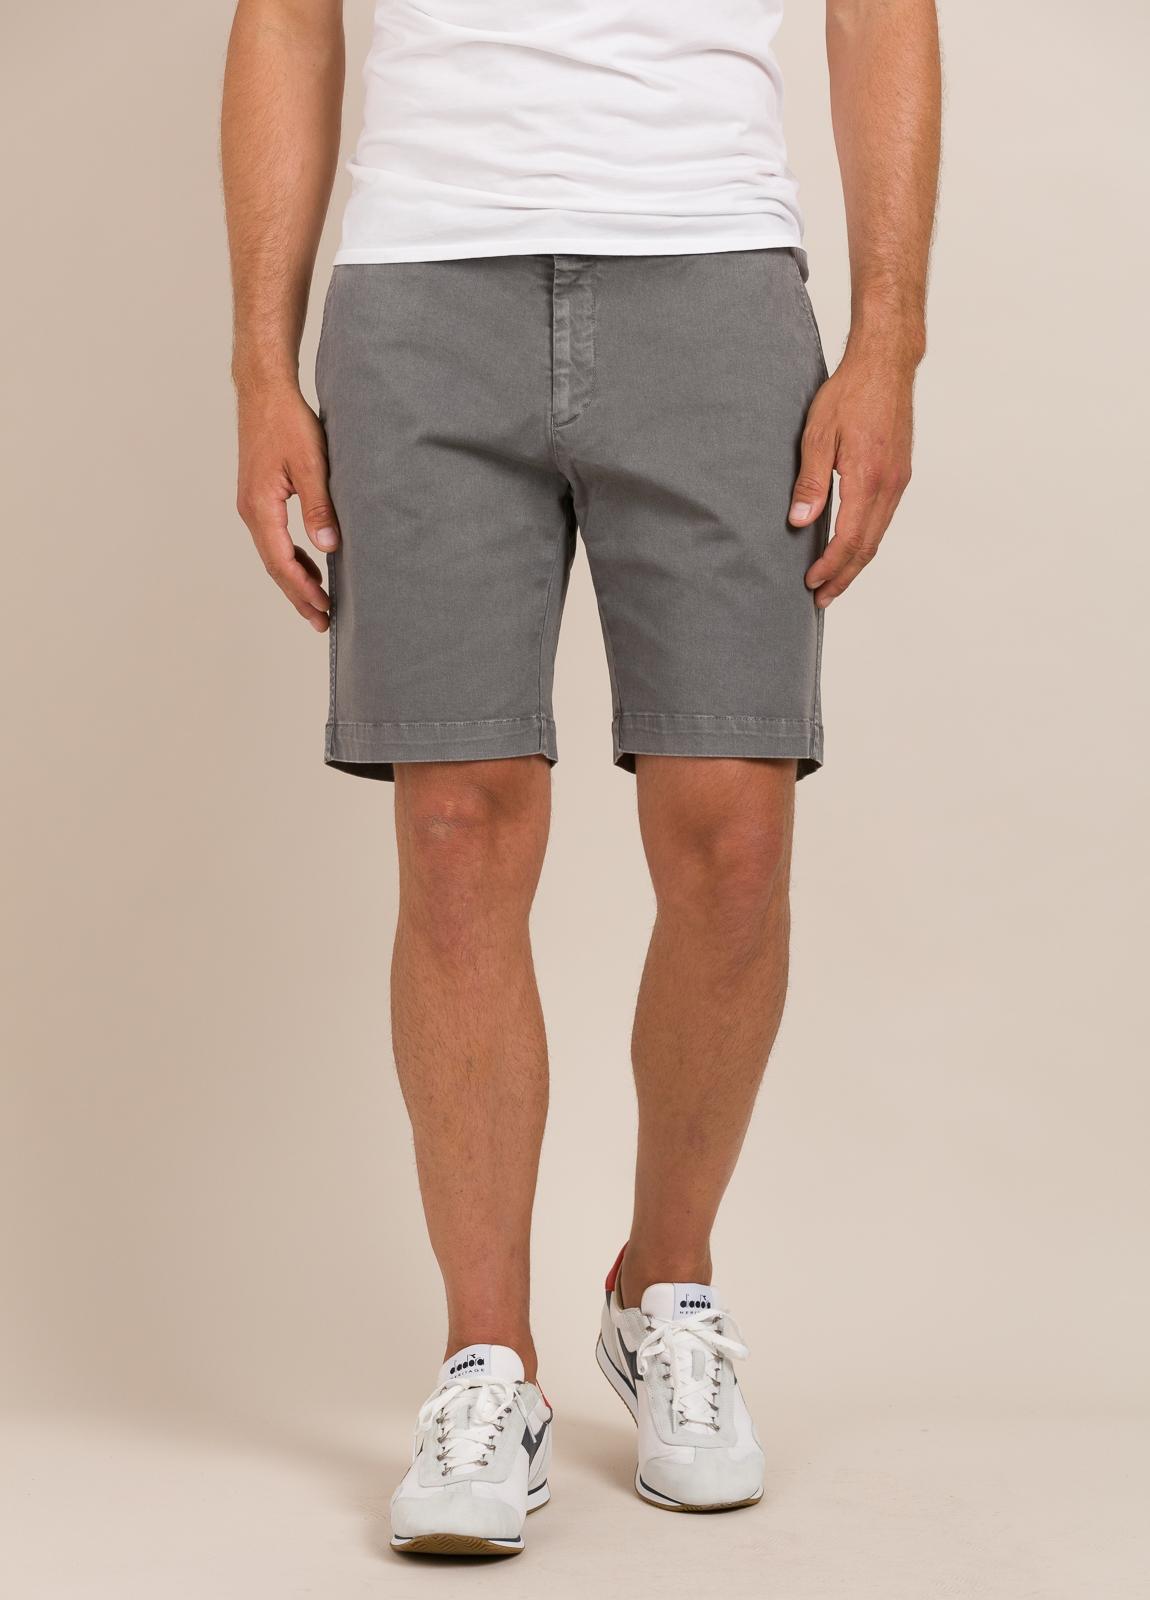 Bermuda modelo THOMAS color gris, 100% Algodón.